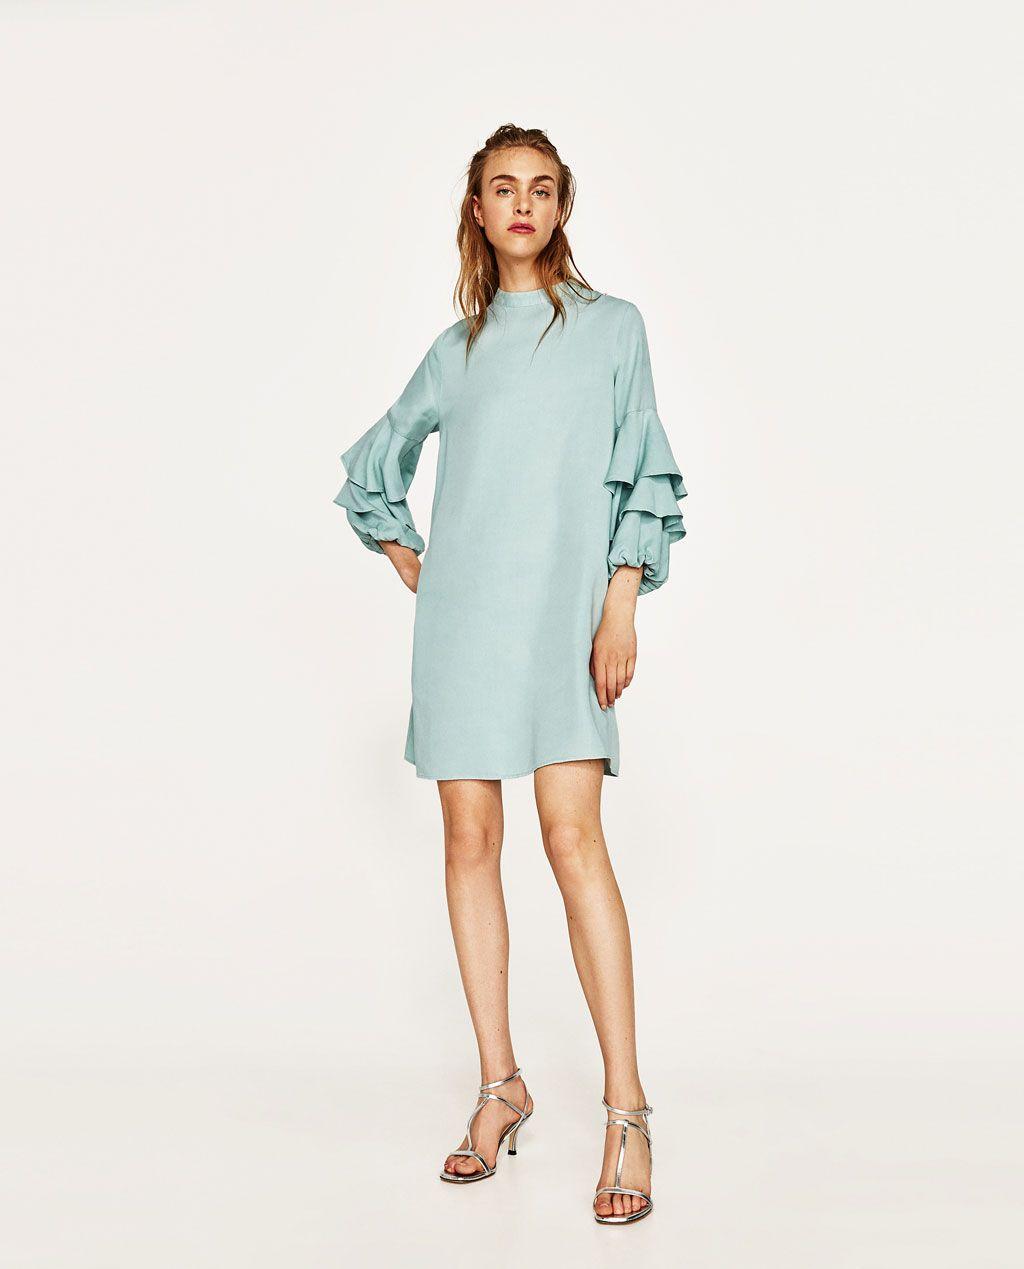 image 1 of frilled sleeve dress from zara | ruffles fashion